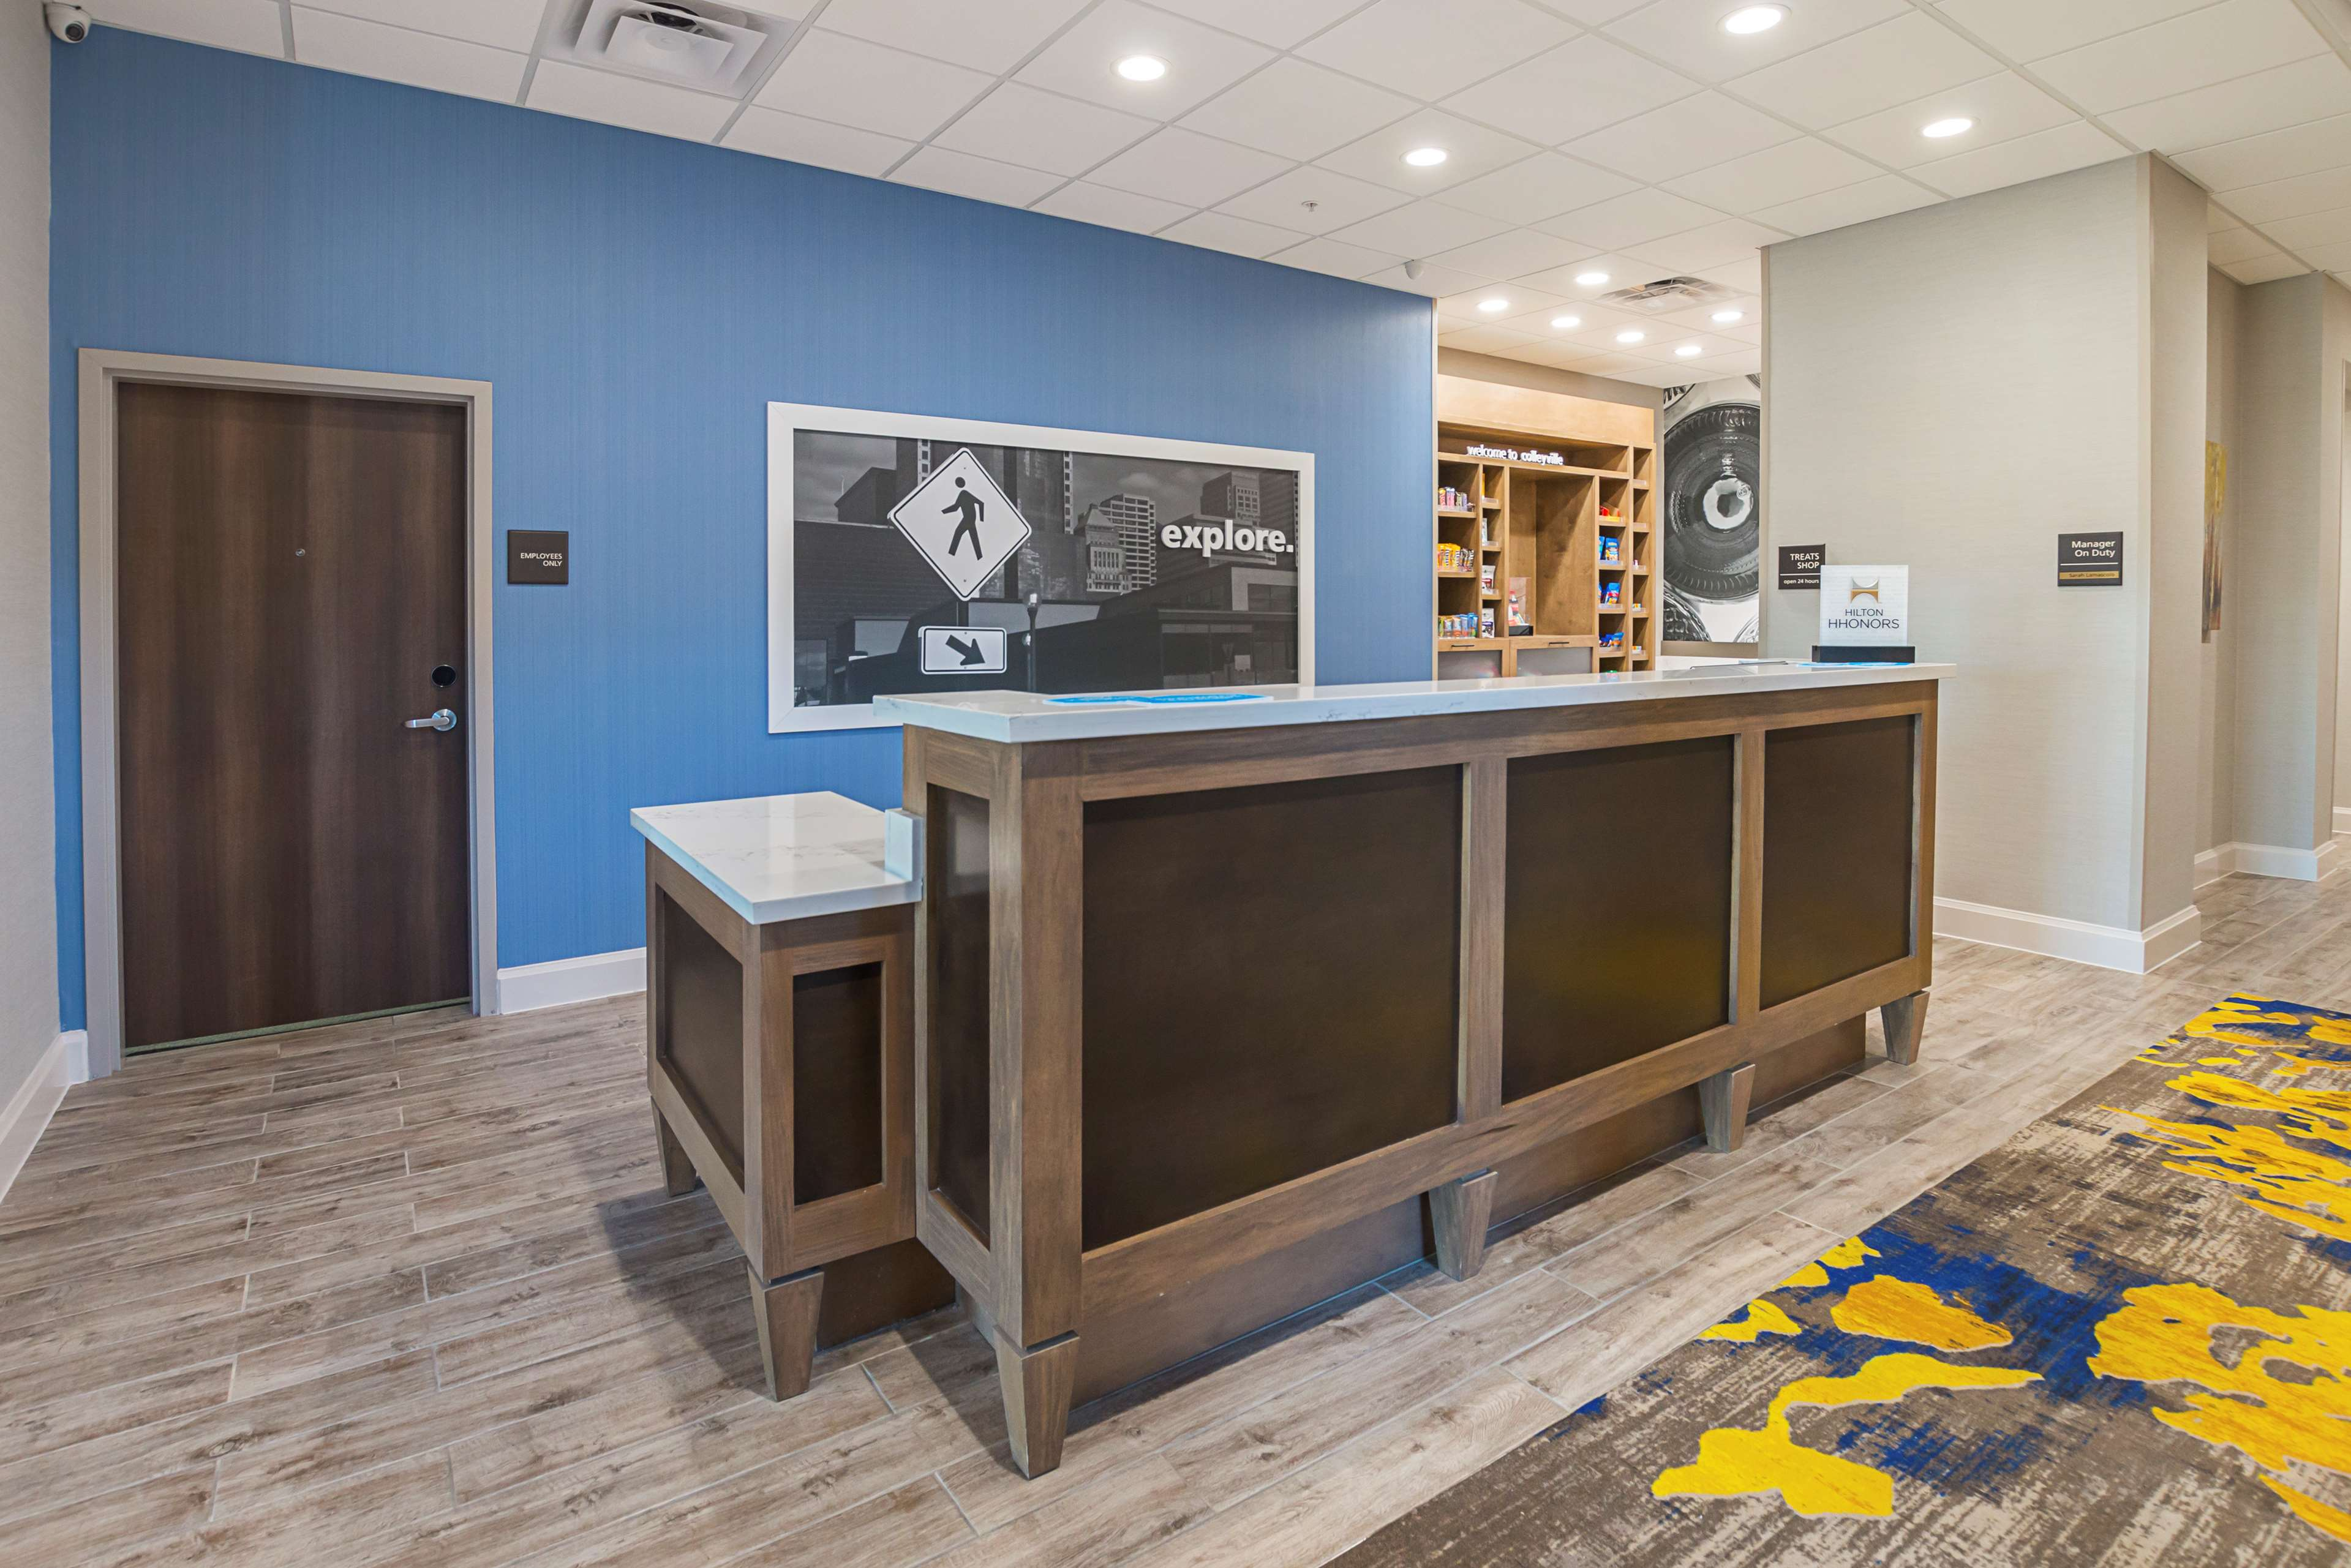 Hampton Inn & Suites Colleyville DFW West image 5